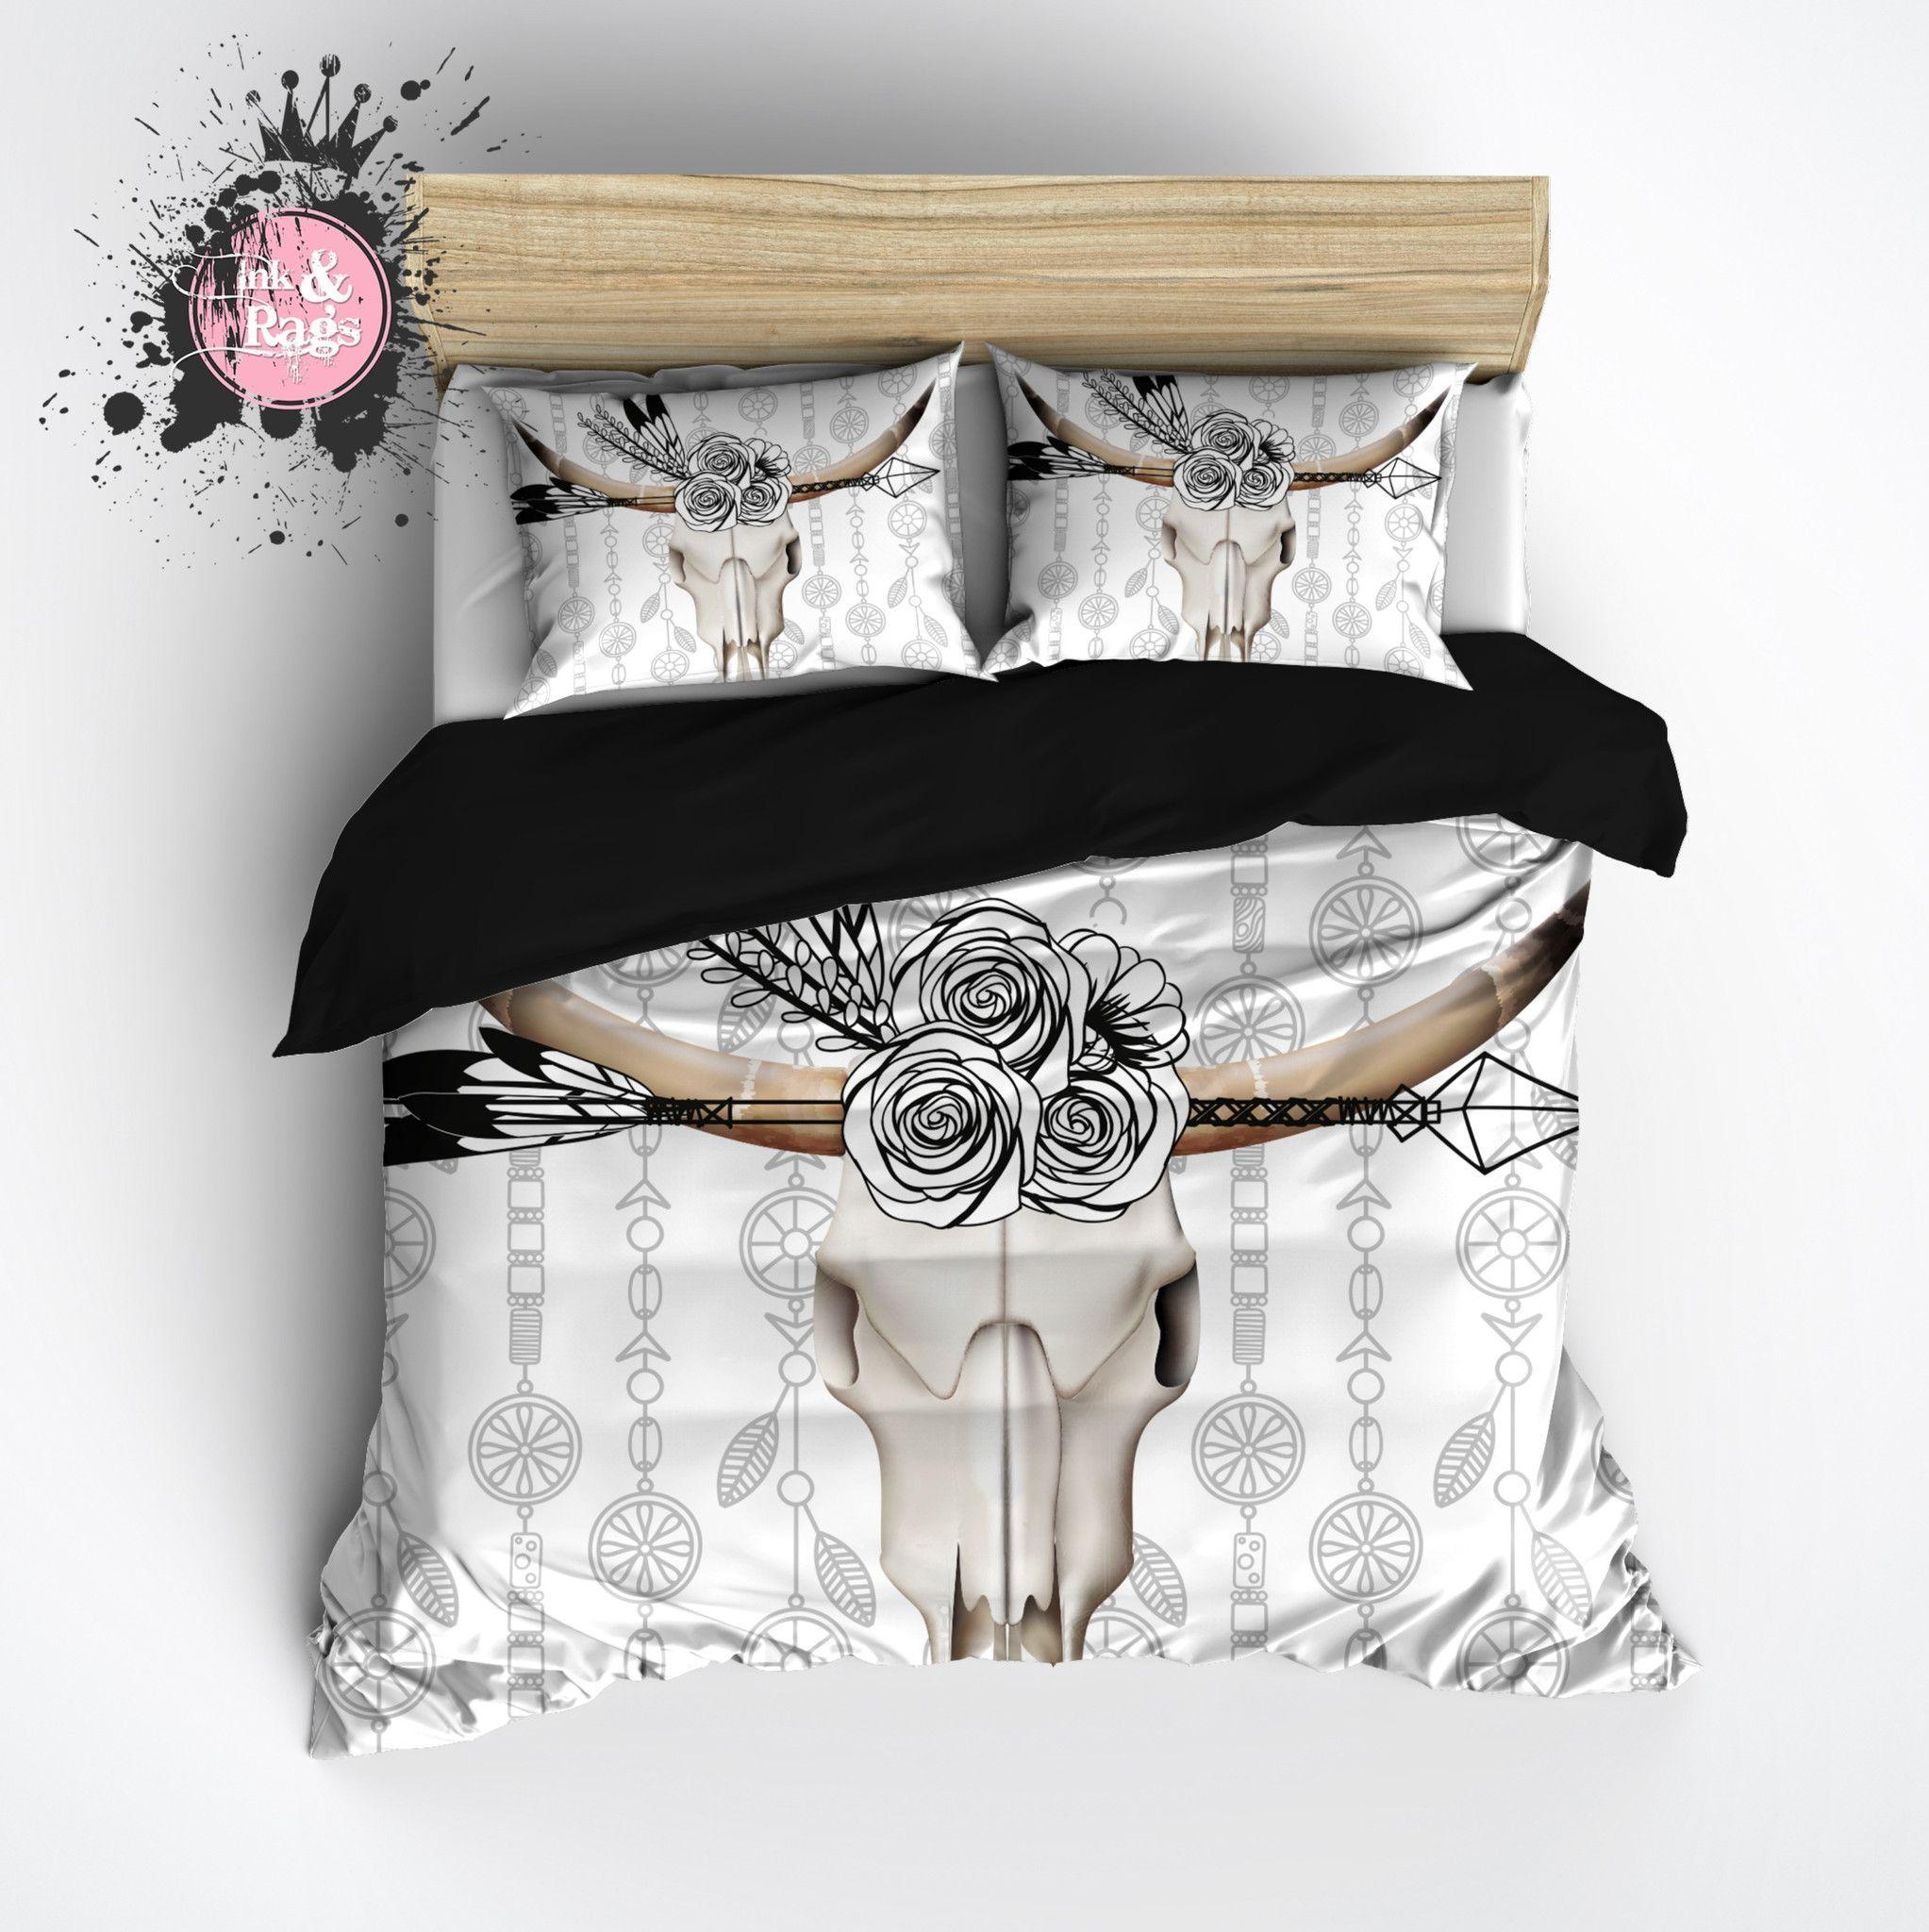 Skull Bedroom Accessories Bedding Southwest Dream Catcher Skull Floral Watercolor